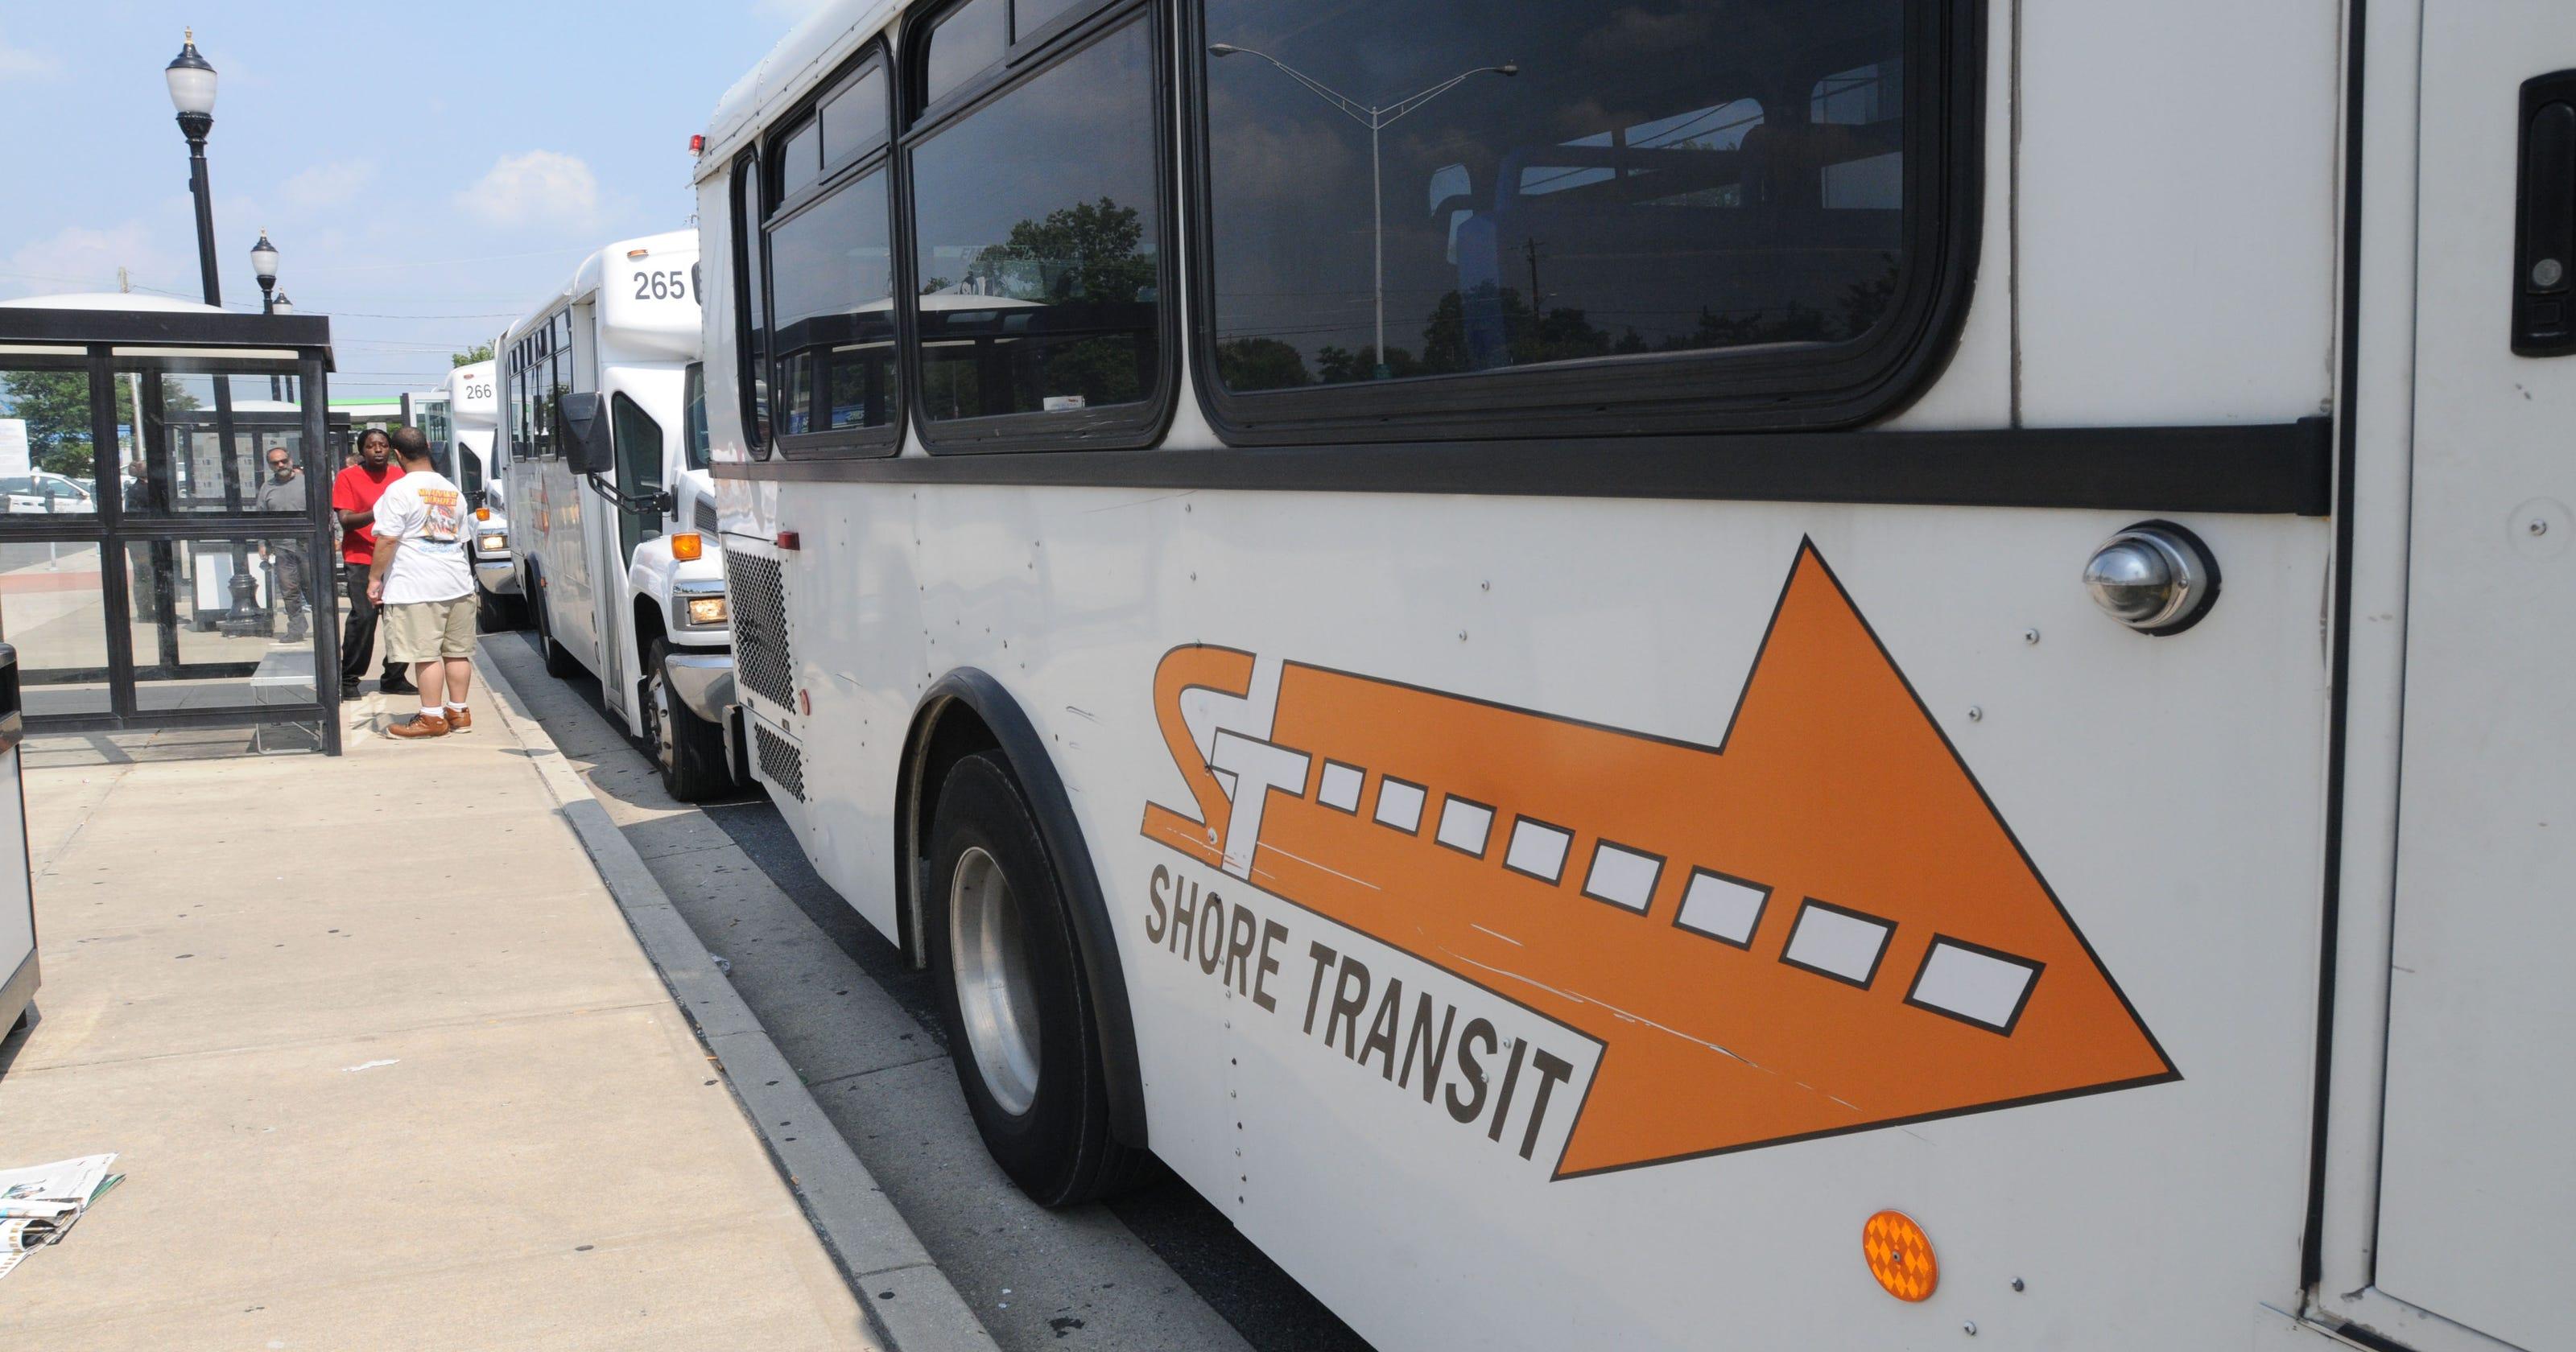 Public transportation sees increase along Eastern Shore